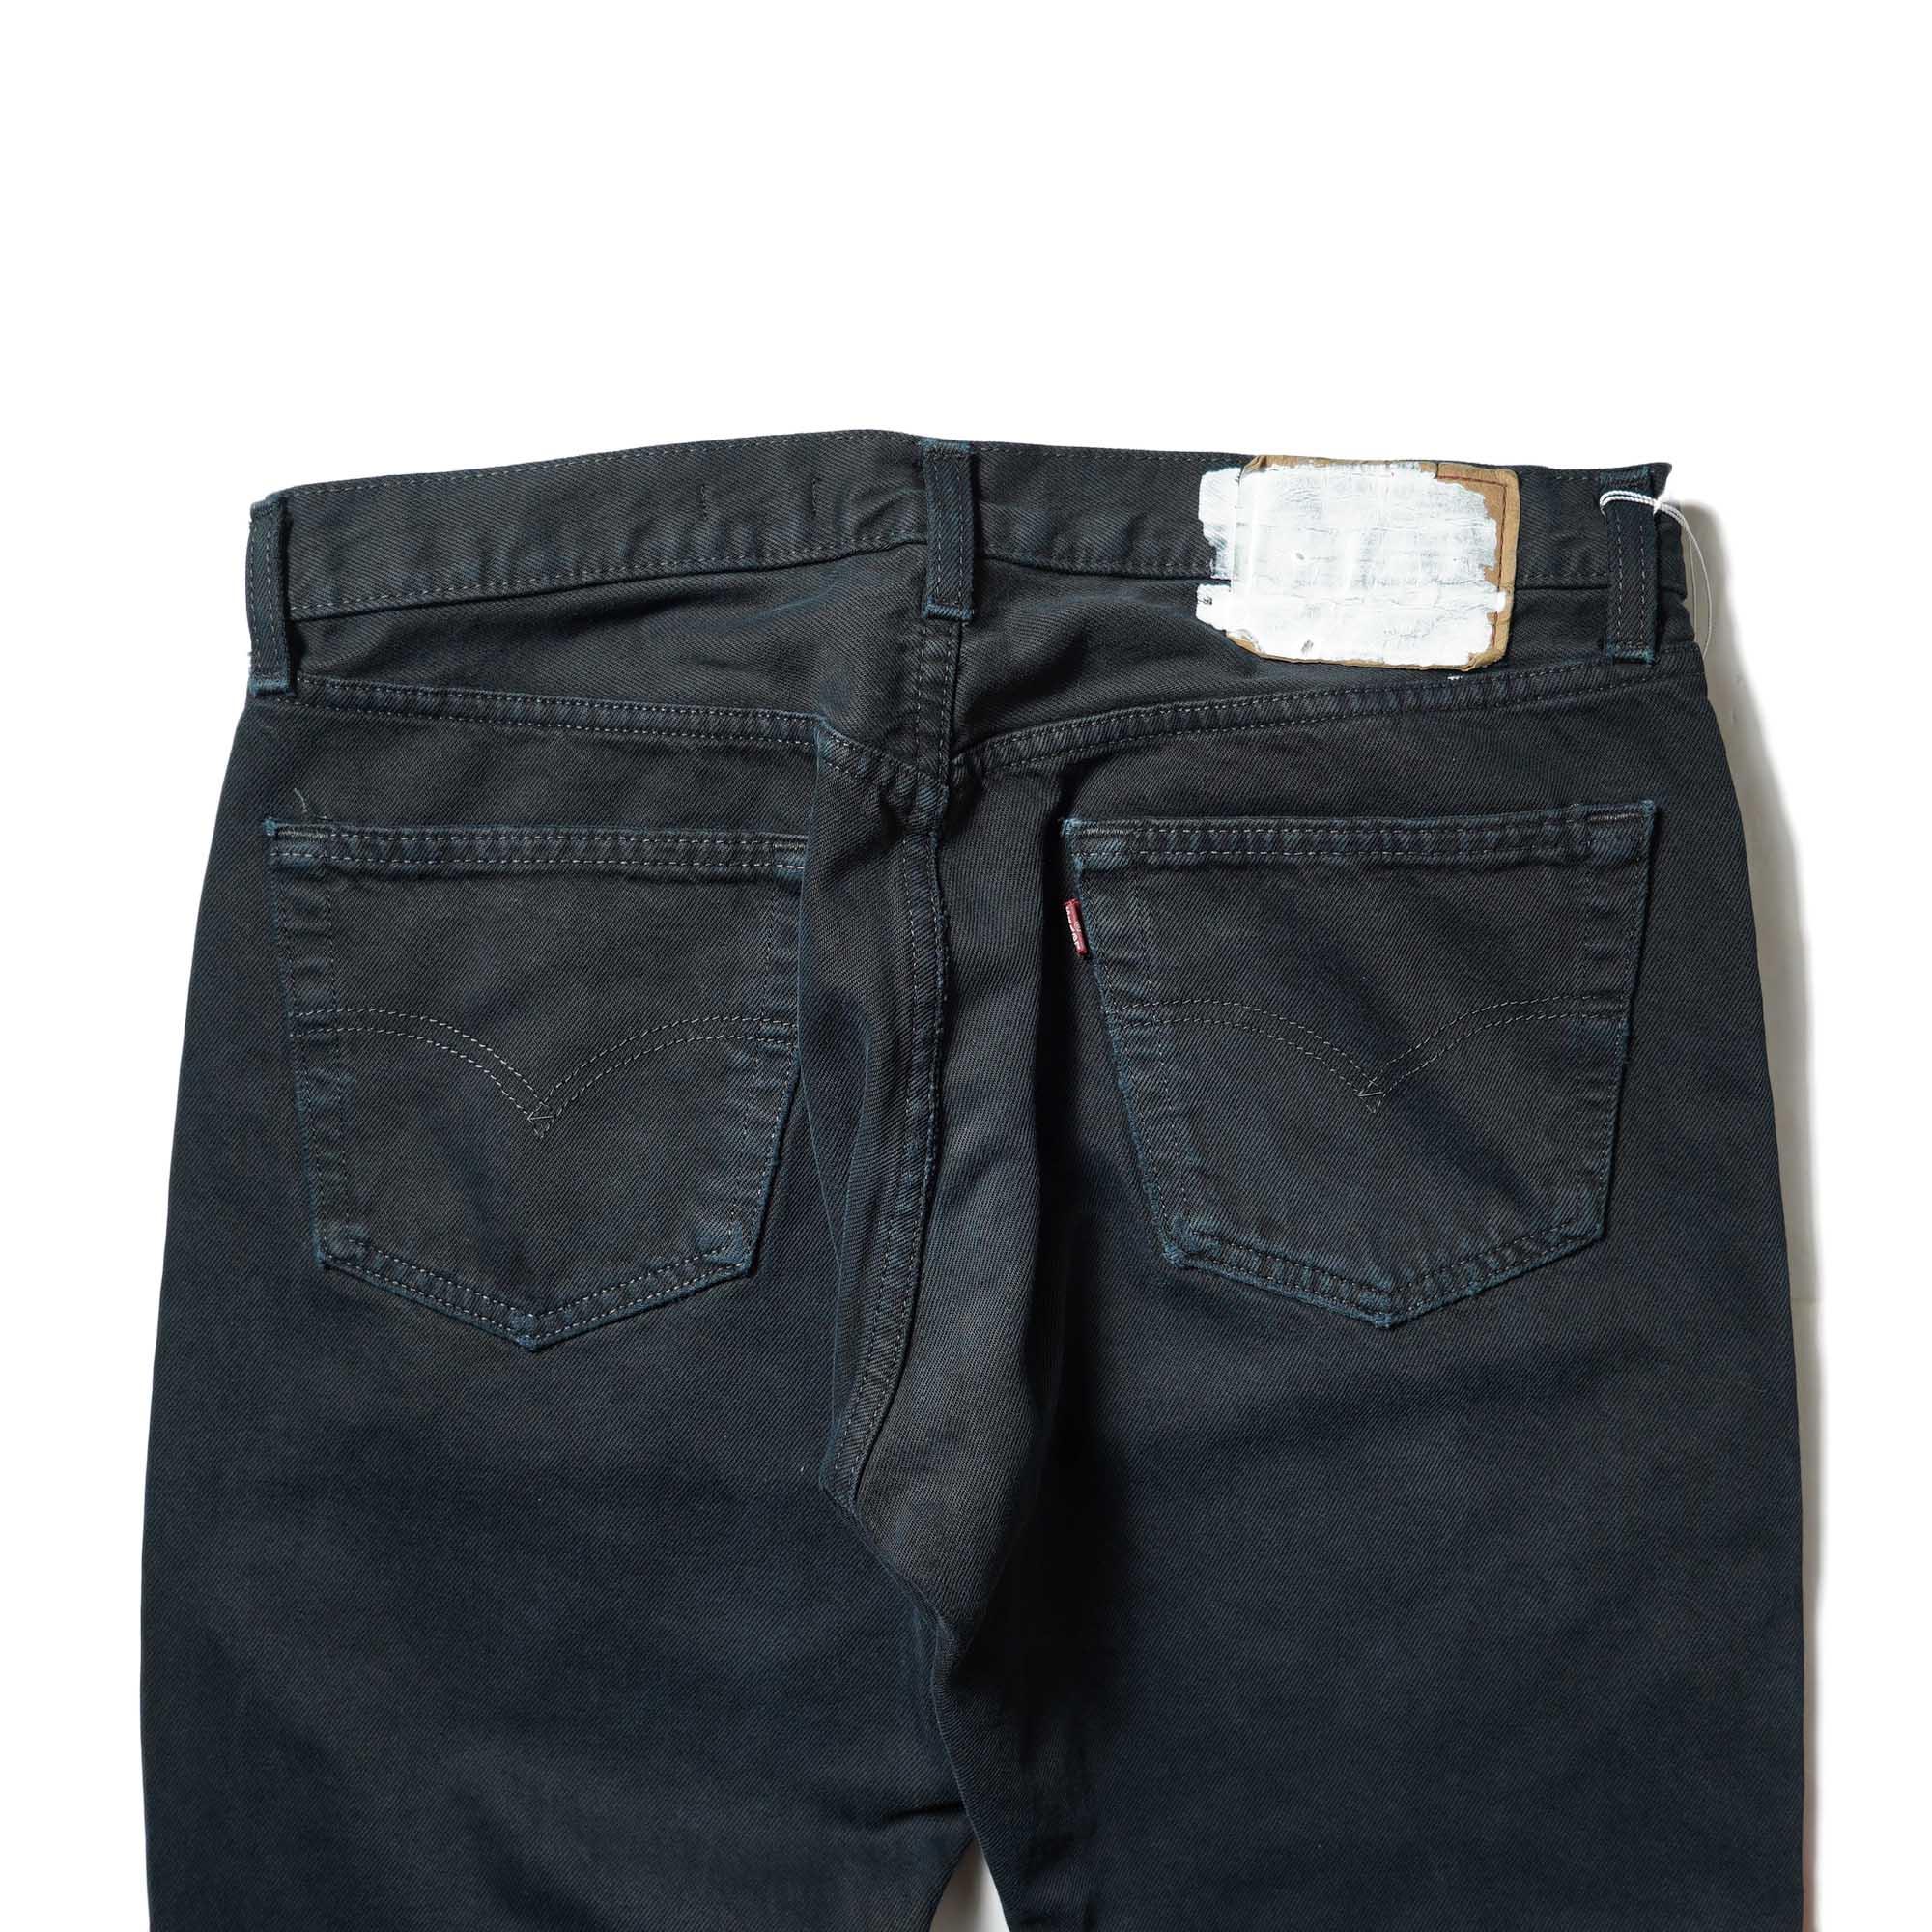 OLD PARK / Western Jeans2 Black (Lsize-B)ヒップポケット